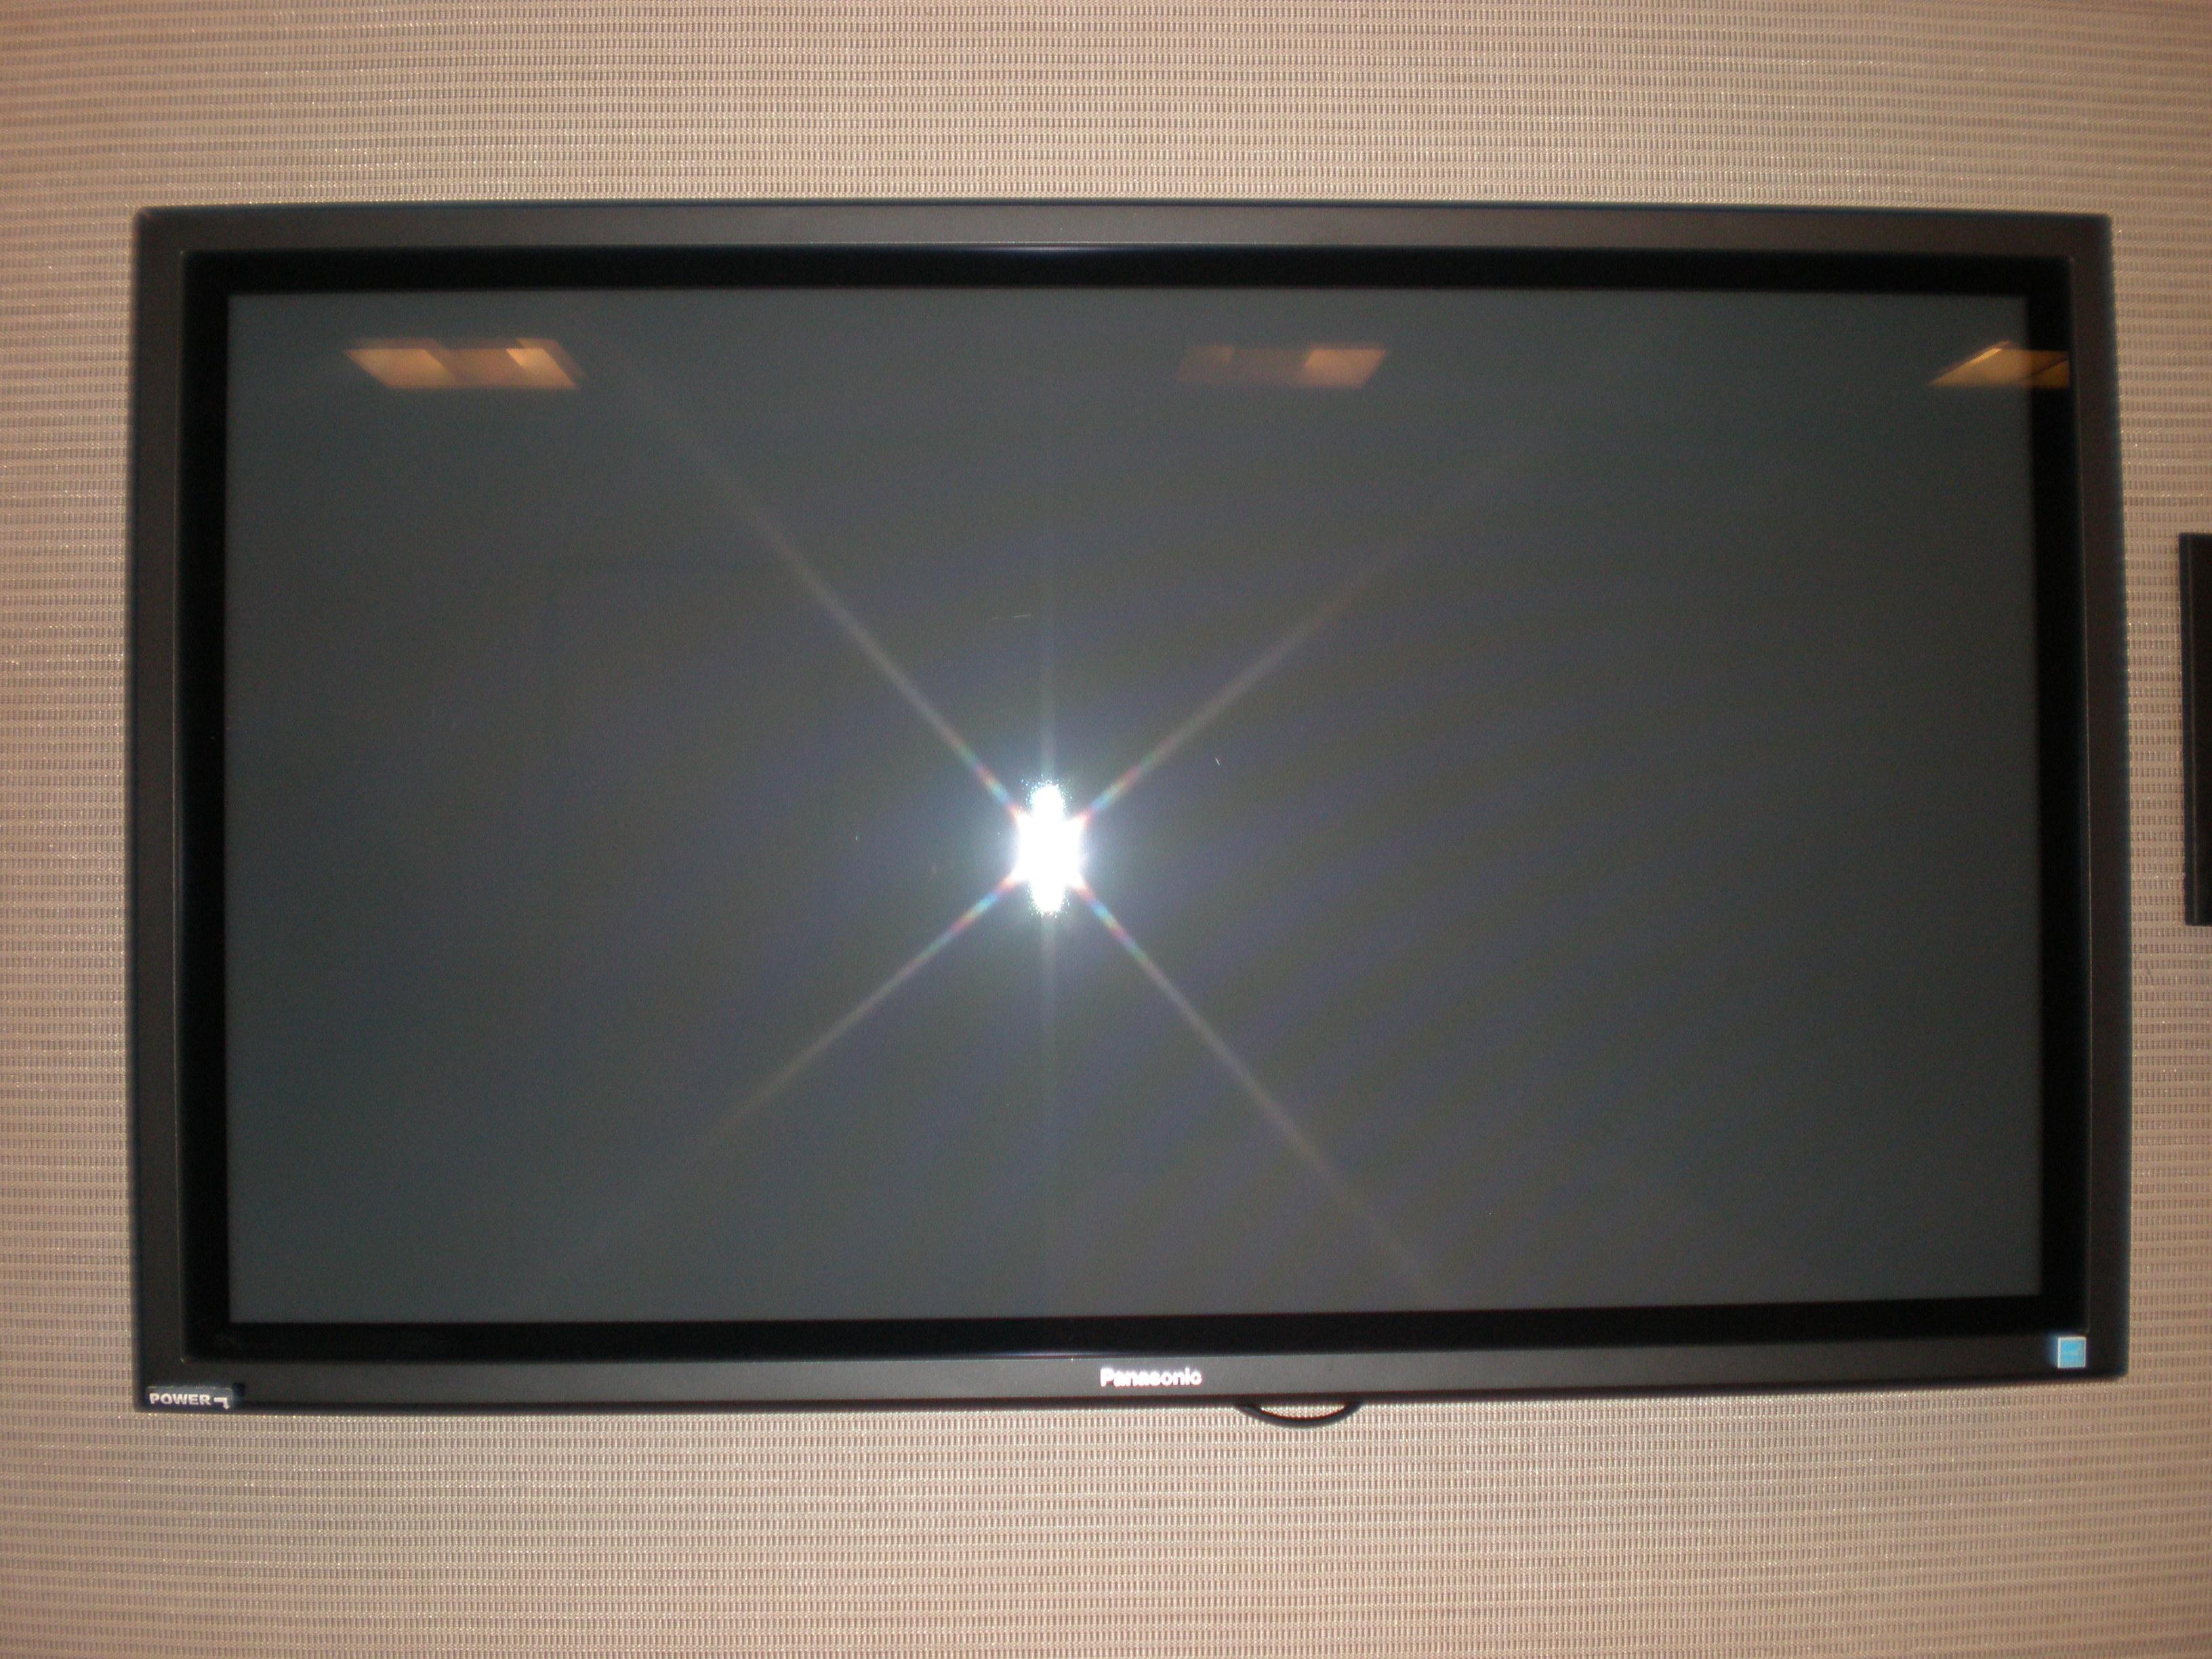 tv 36 inch. file:wall-mounted 36 inch flat panel panasonic tv.jpg tv i